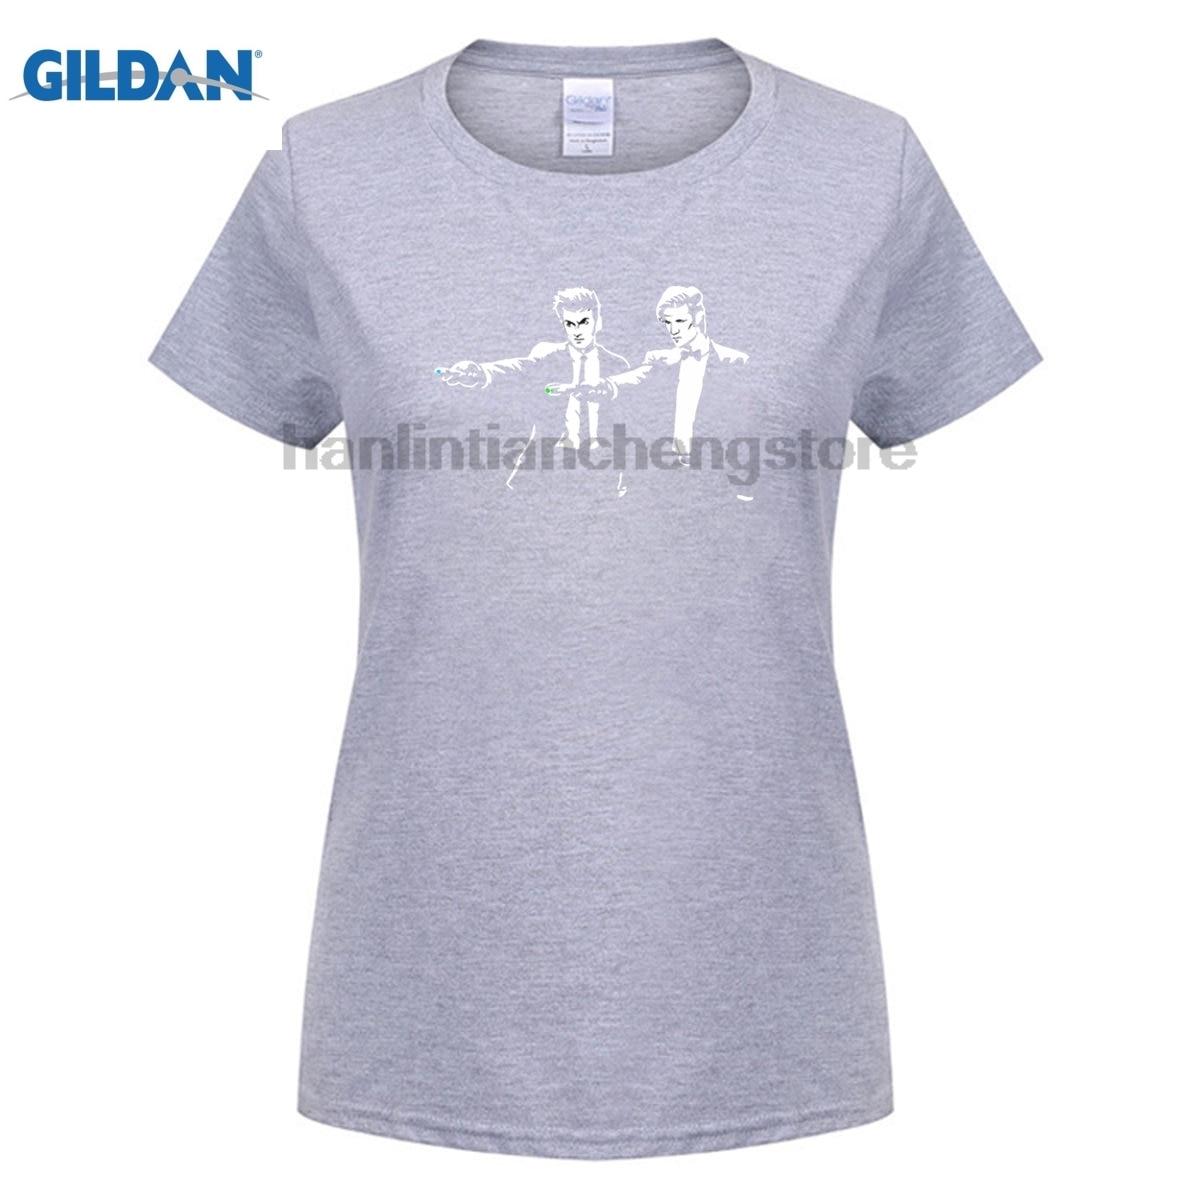 GILDAN 2018 summer womans DIY T-shirts Doctor Who short sleeve O-neck big yard cotton boy solid T-shirt A+quality